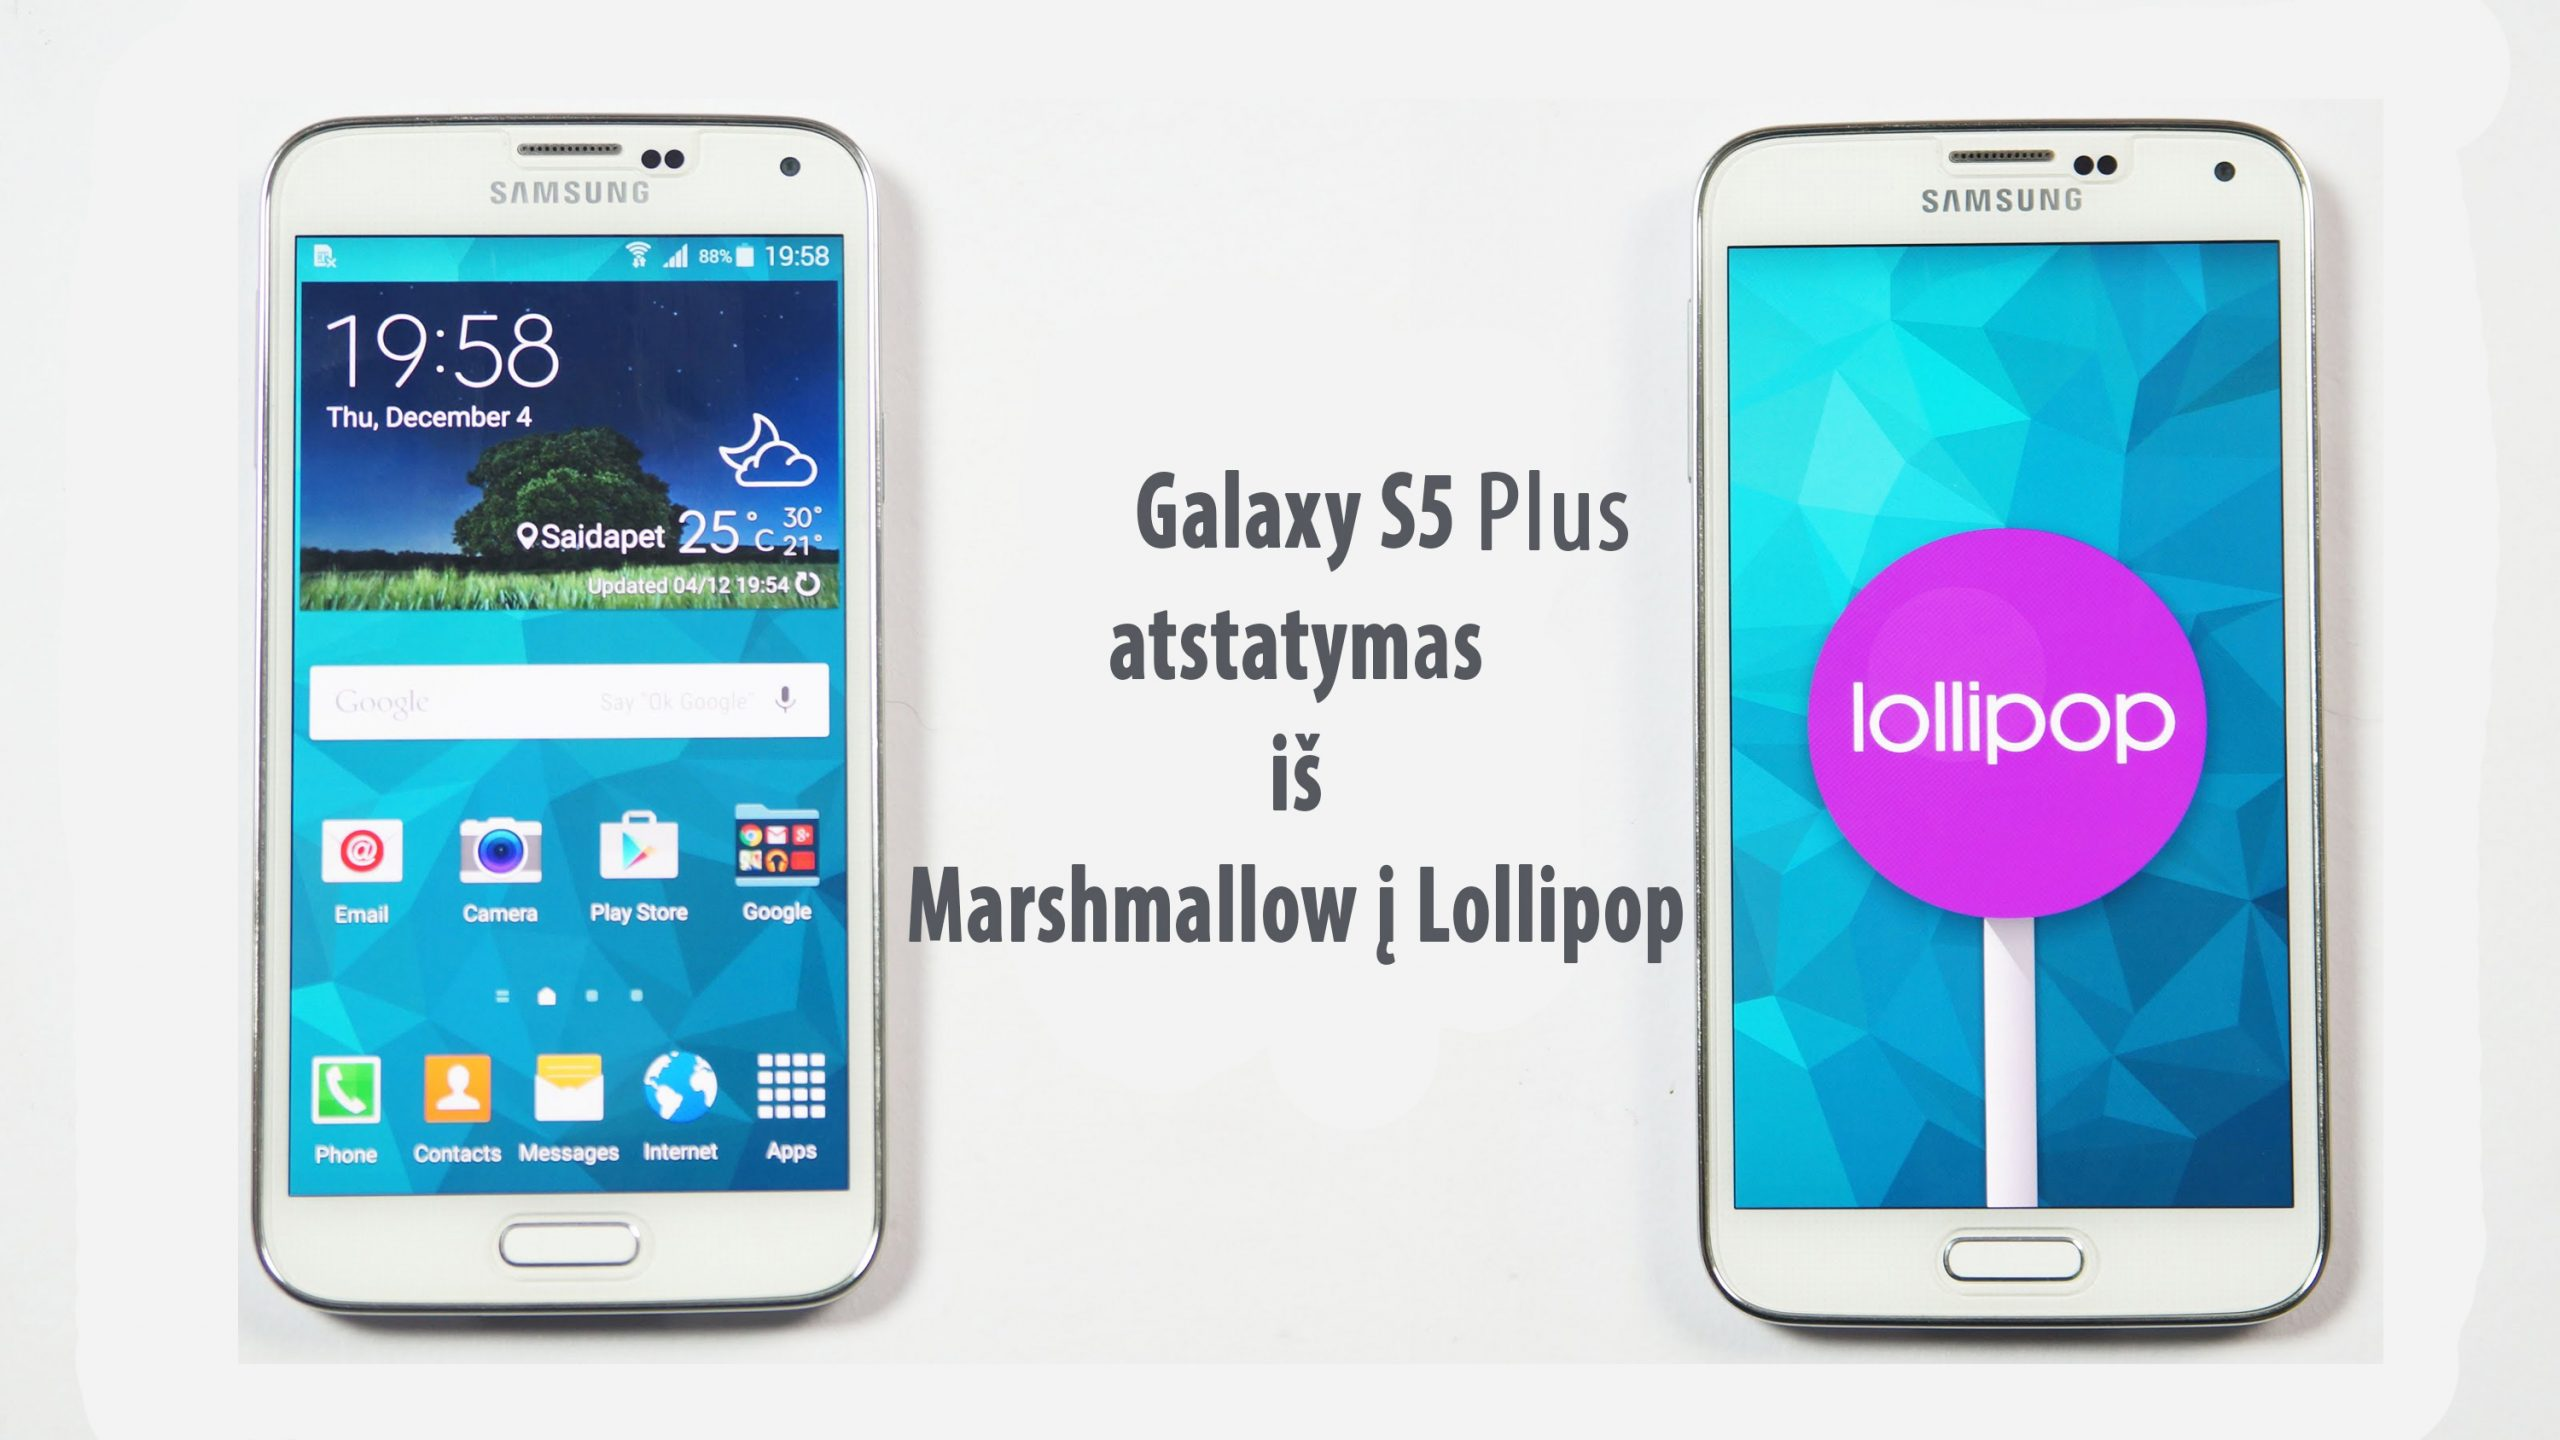 Galaxy-S5-Plus-atstatymas-Lollipop-scaled.jpg